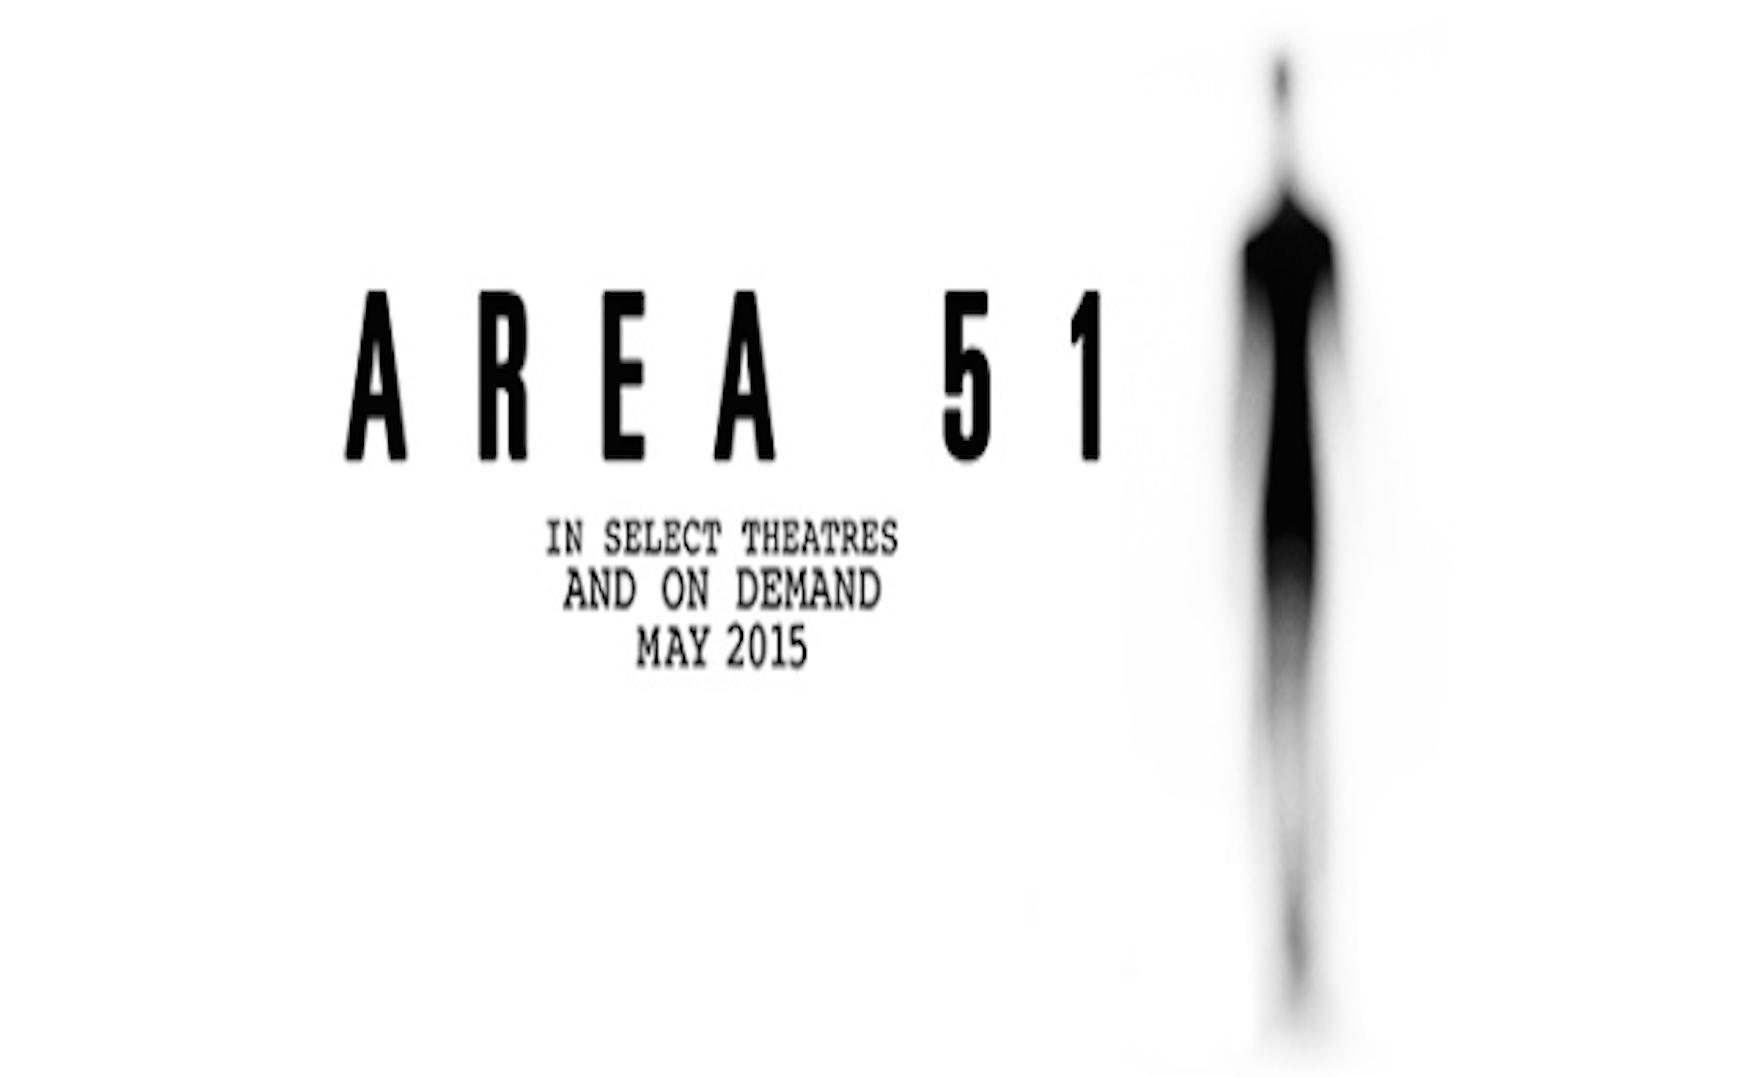 free, movie, download, 2015, ryemovies, ganool, update, area 51, Sandra Staggs, Suze Lanier-Bramlett, Glenn Campbell